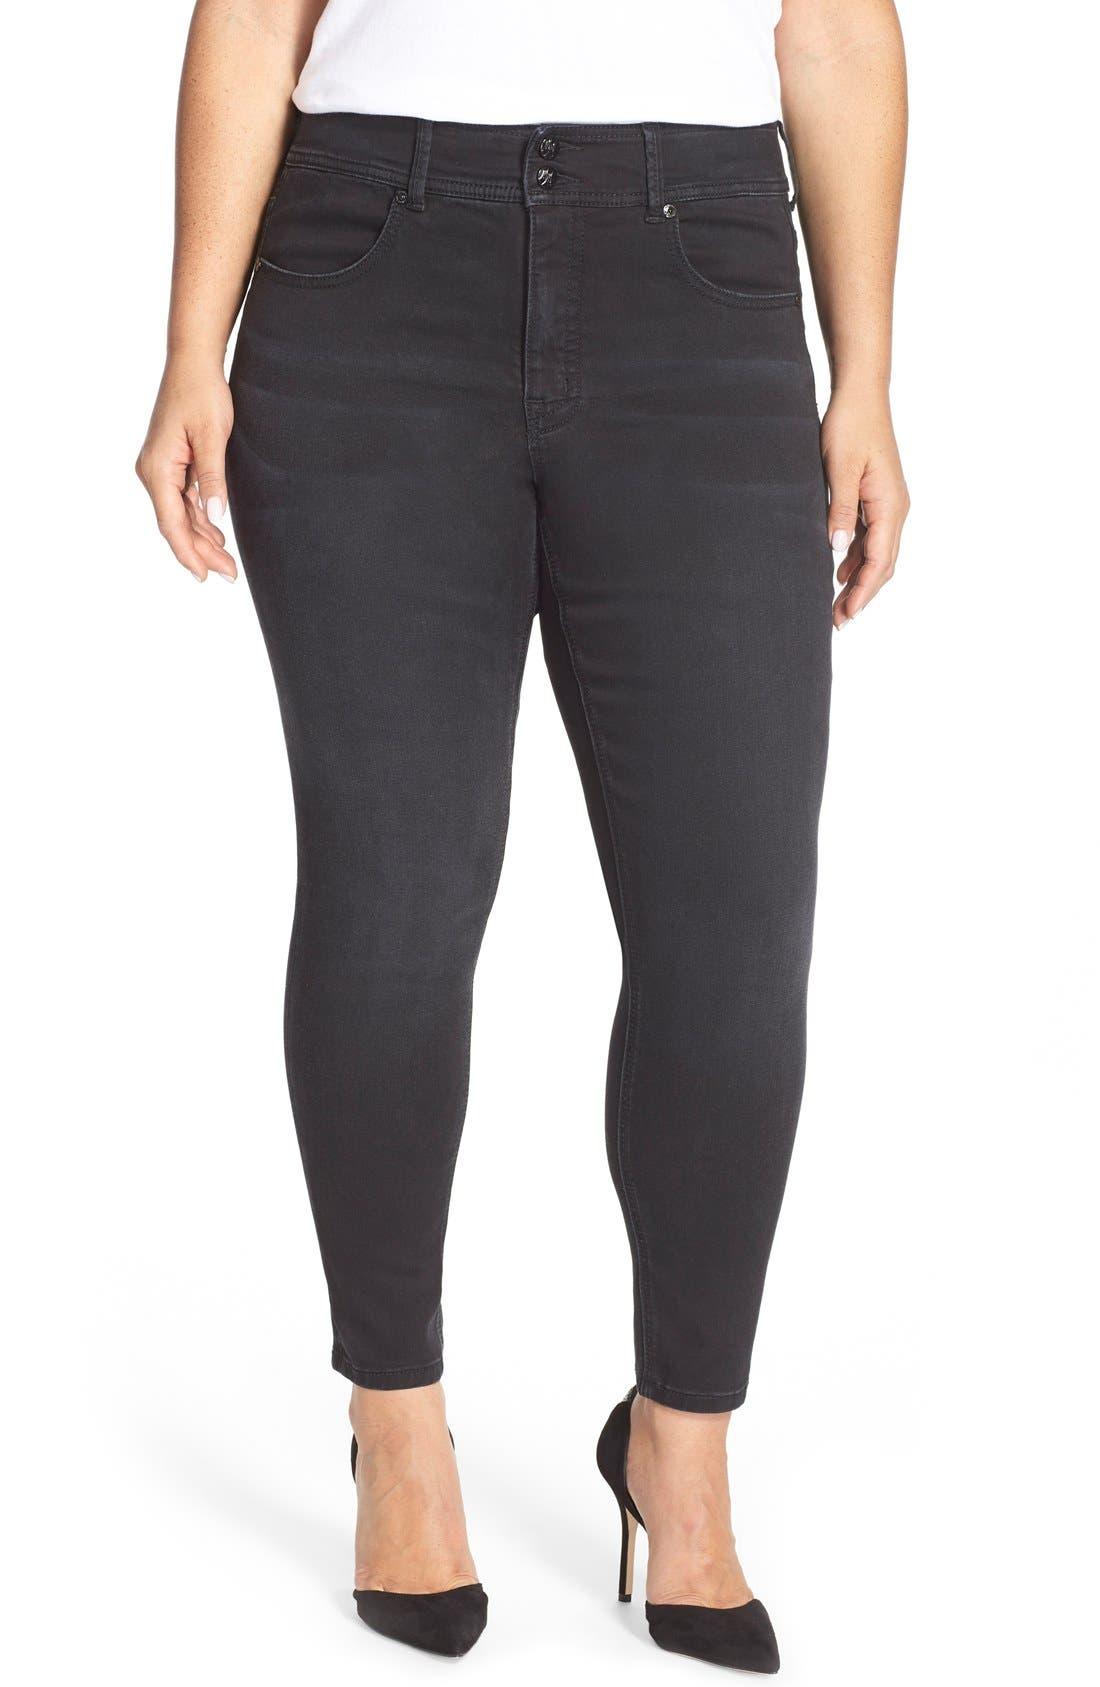 Main Image - Melissa McCarthy Seven7 High Rise Pencil Jeans (Guardian) (Plus Size)